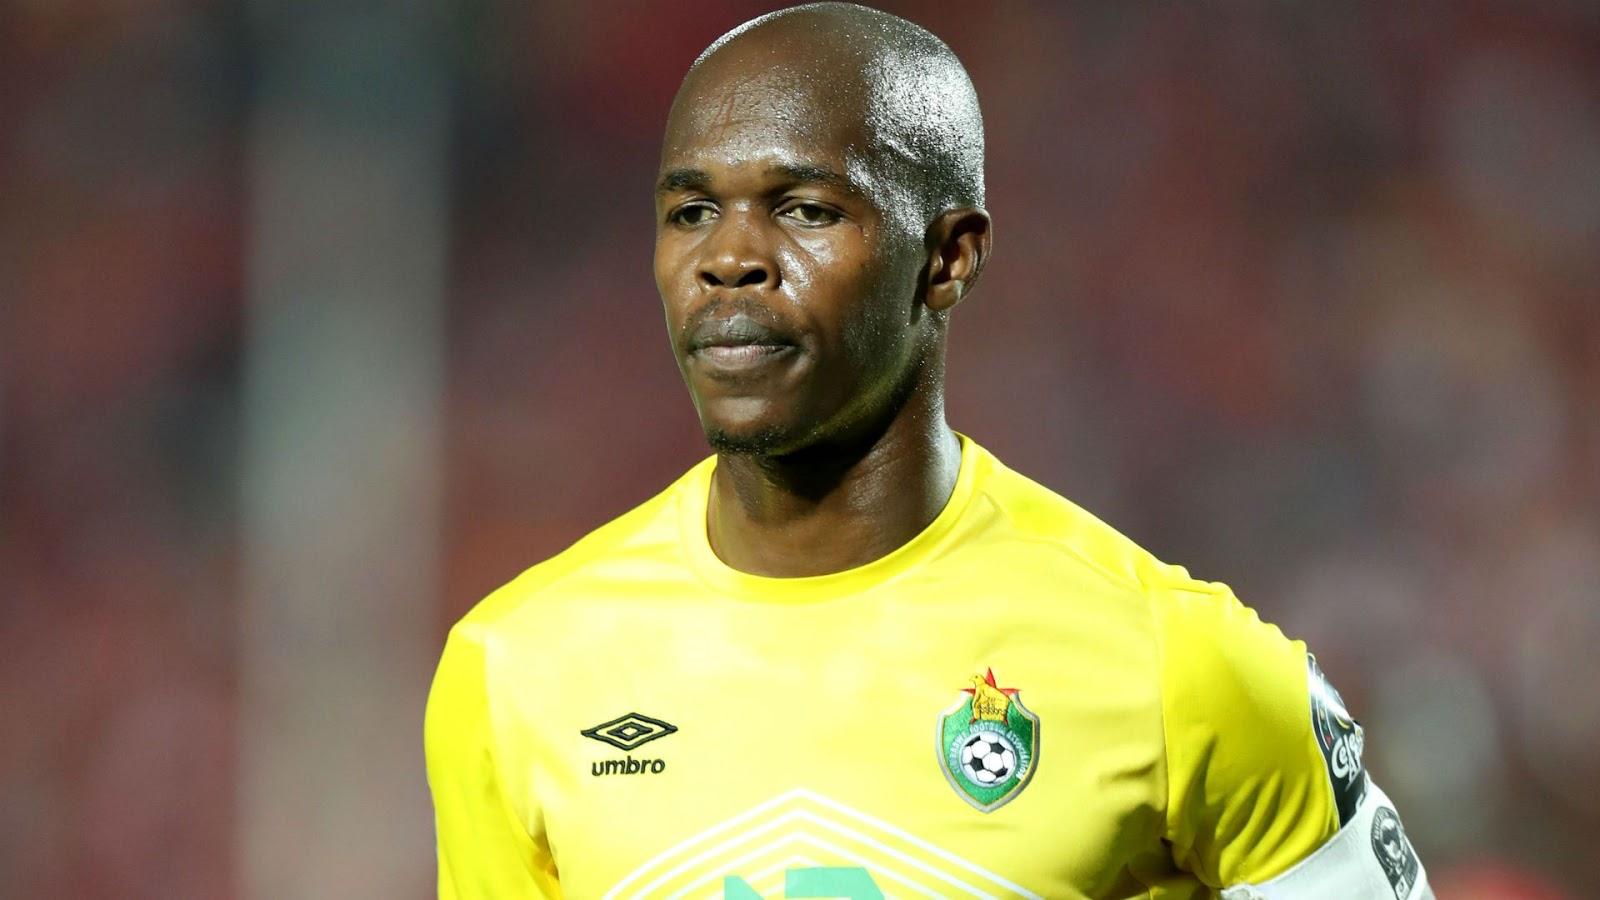 Anderlecht FC striker Knowledge Musona